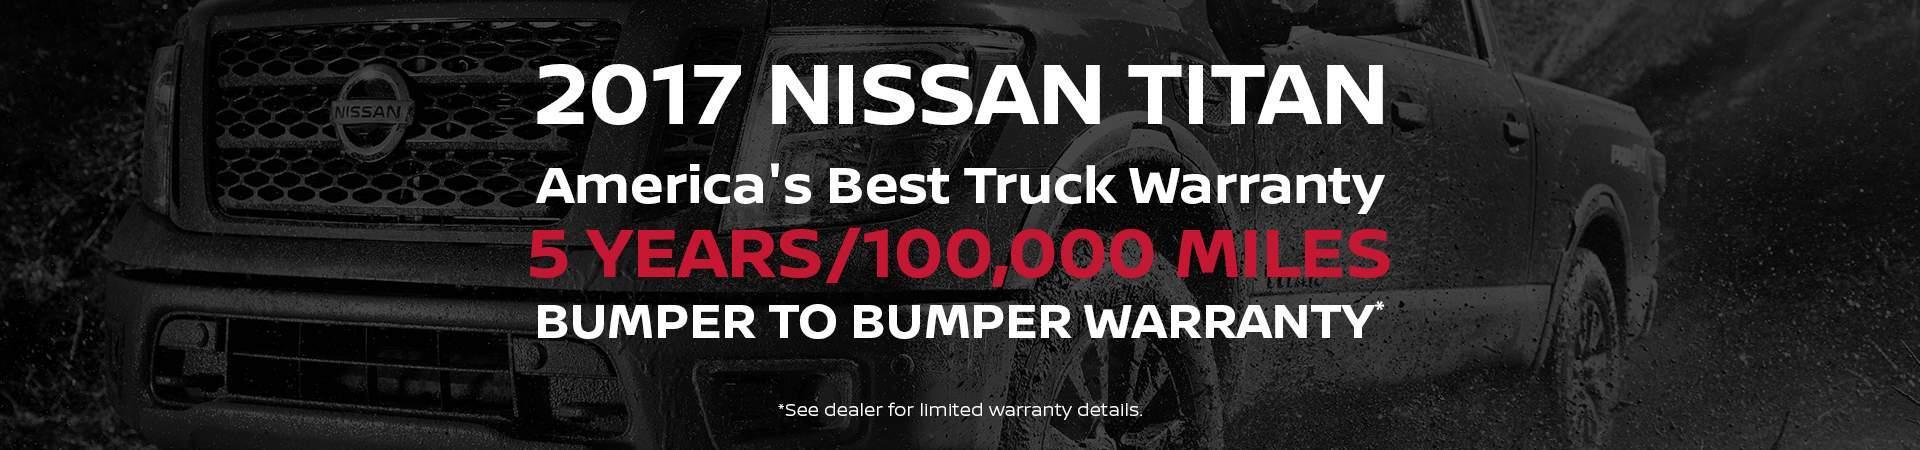 Nissan Dealership Houston Tx Used Cars Robbins Nissan